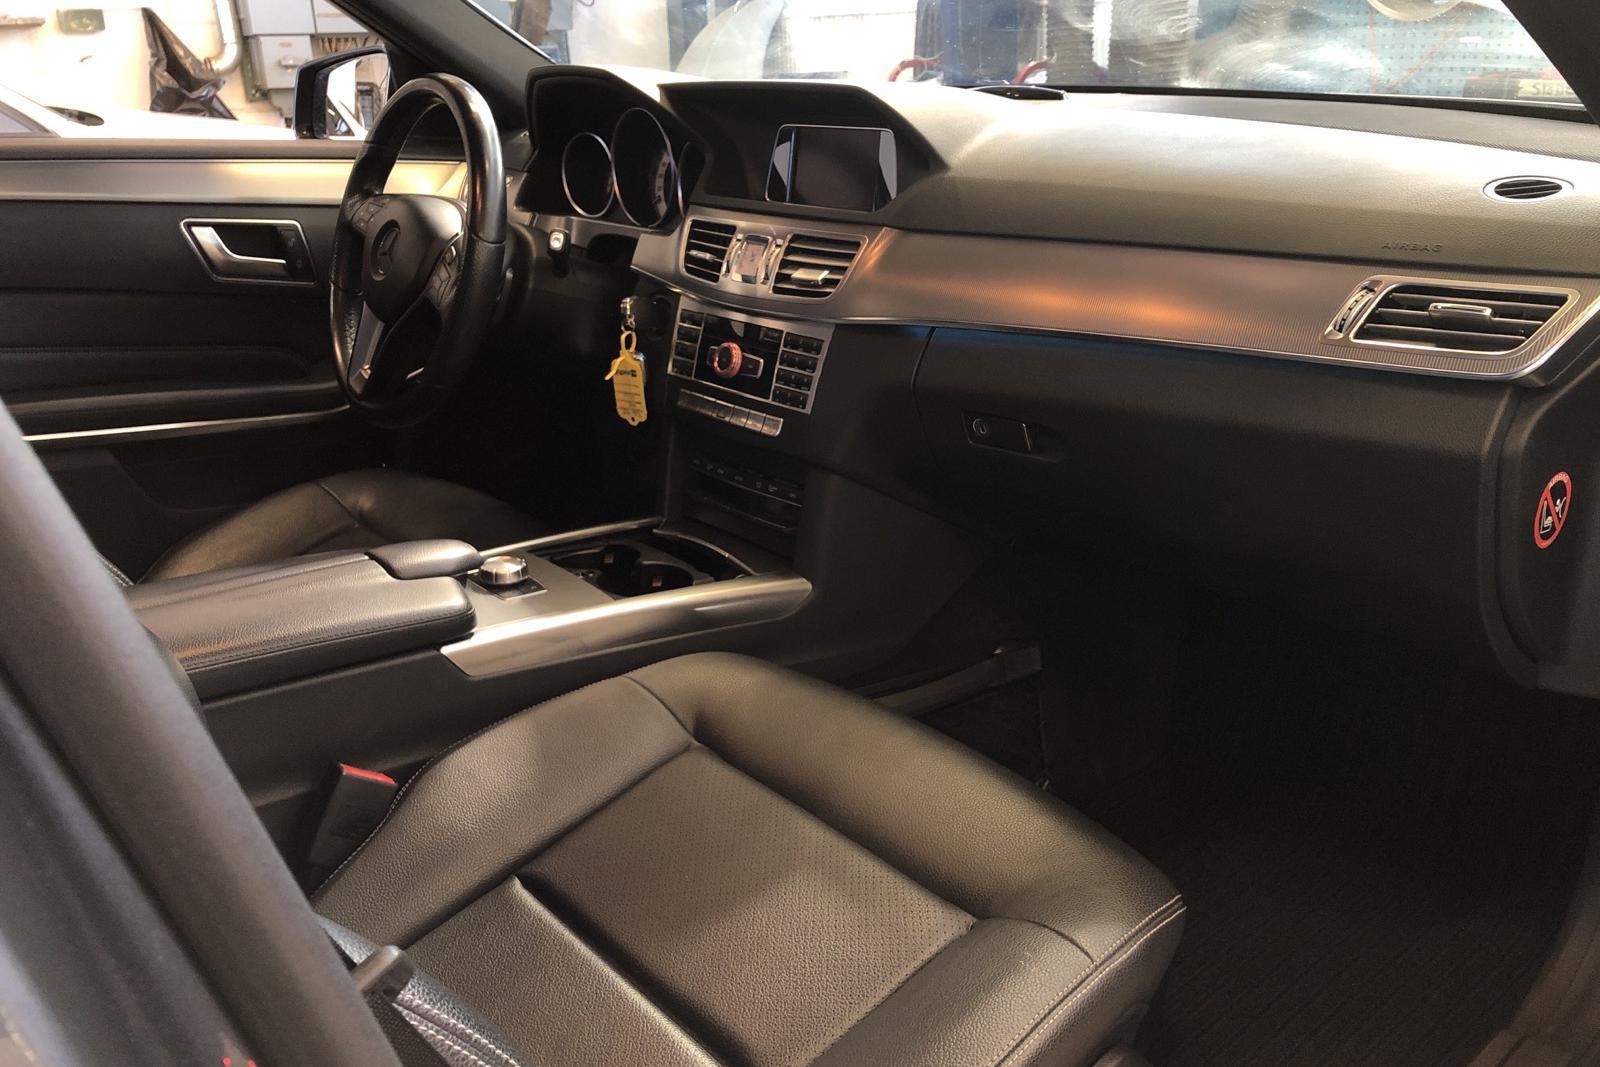 Mercedes E 220 BlueTEC W212 (170hk) - 106 570 km - Automatic - Dark Grey - 2014